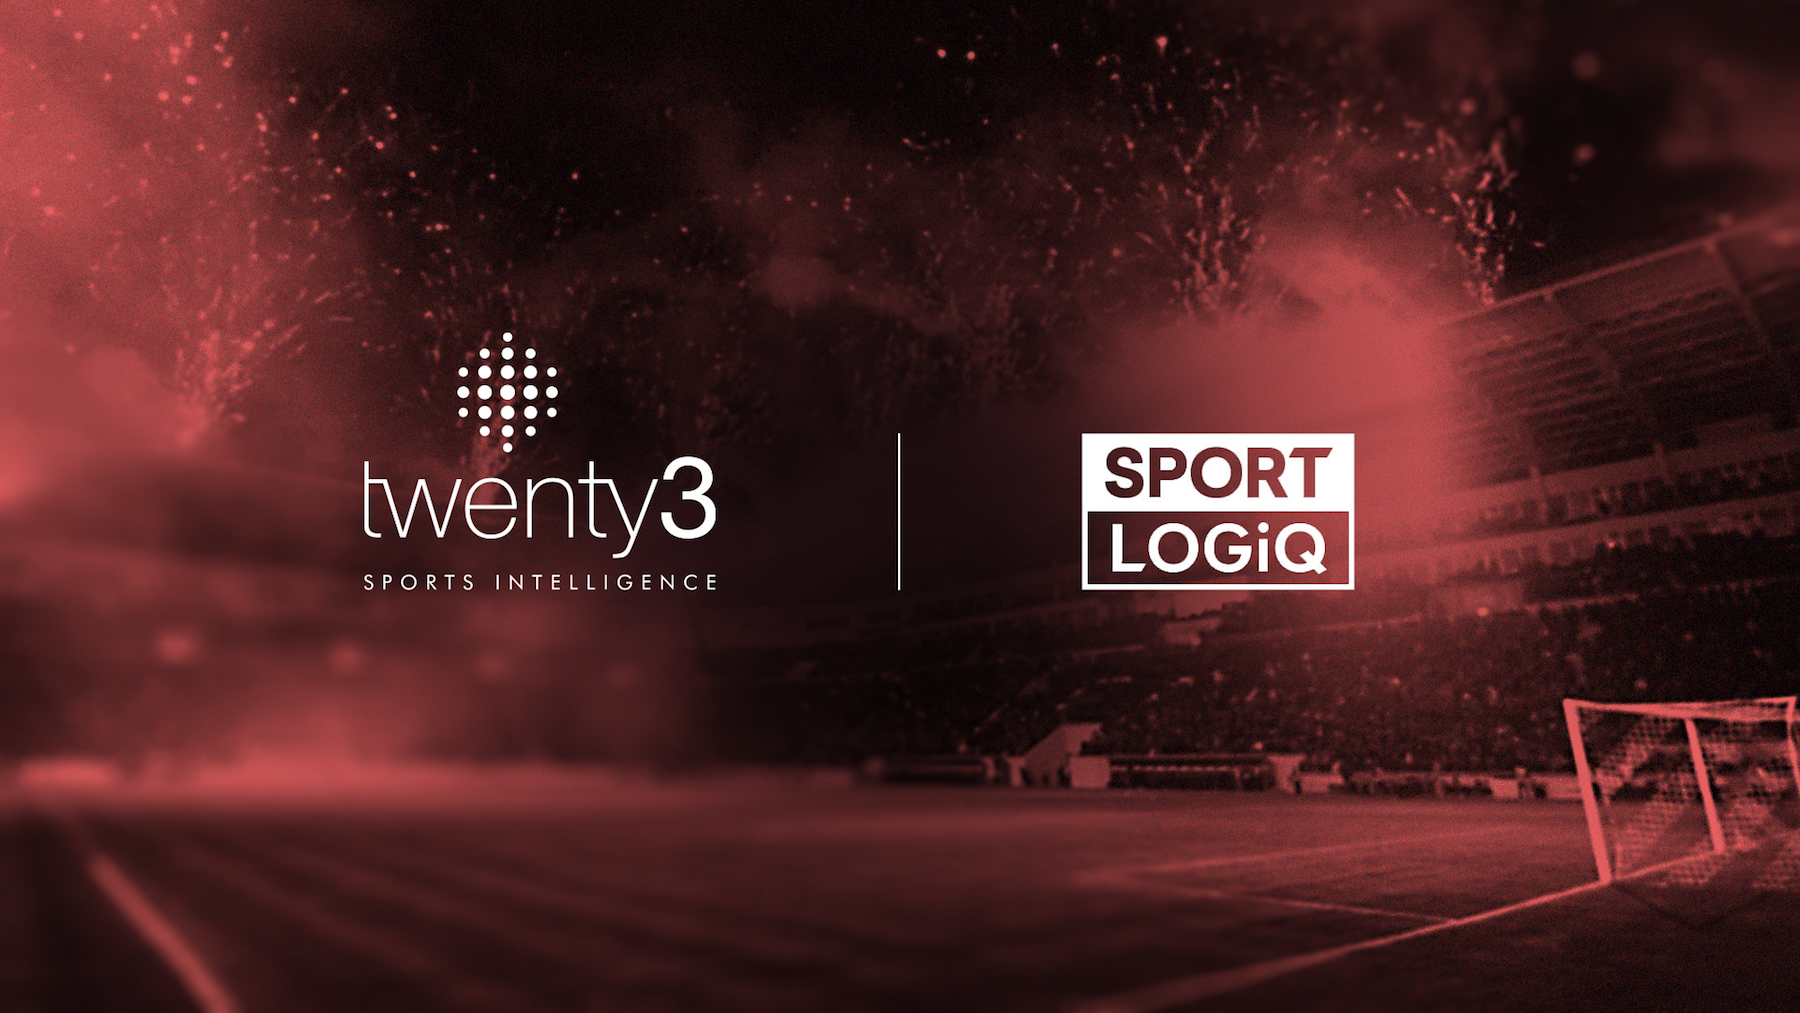 Twenty3-Partnership-Sportlogiq